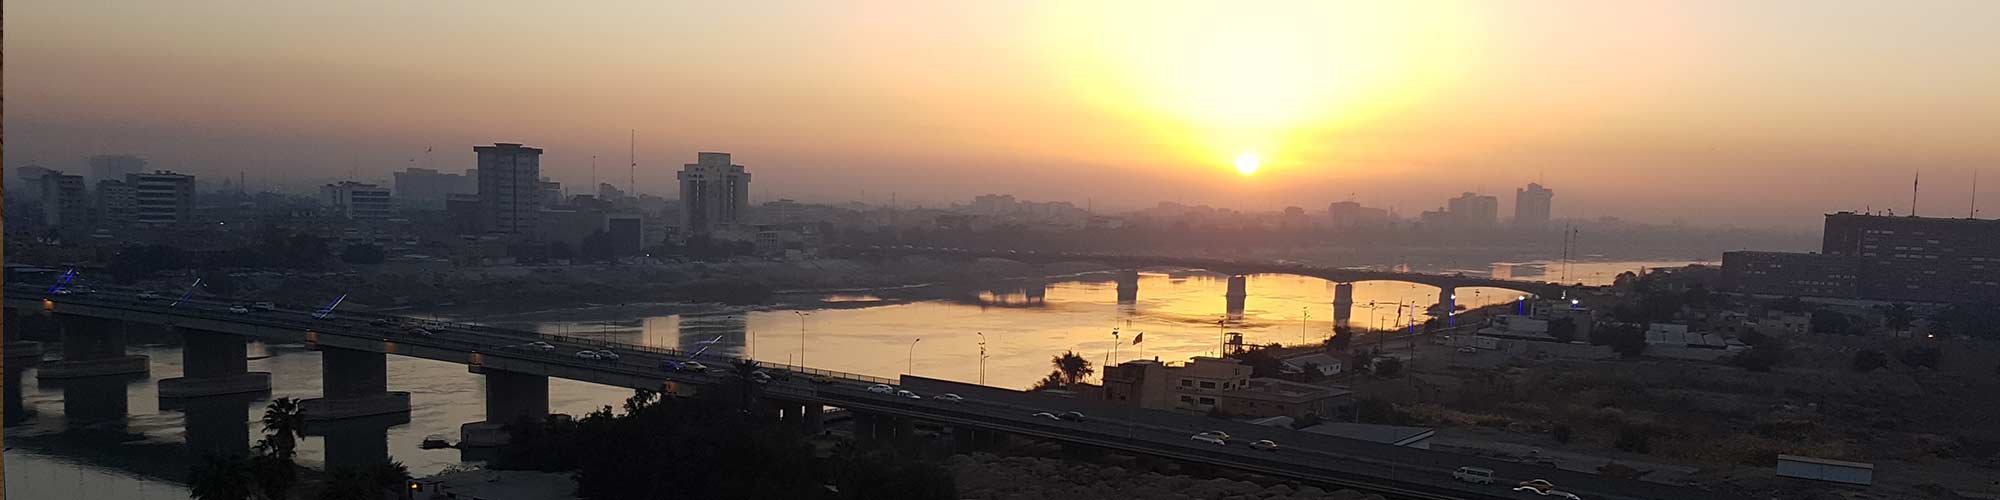 Tigris- El Pais Viajes